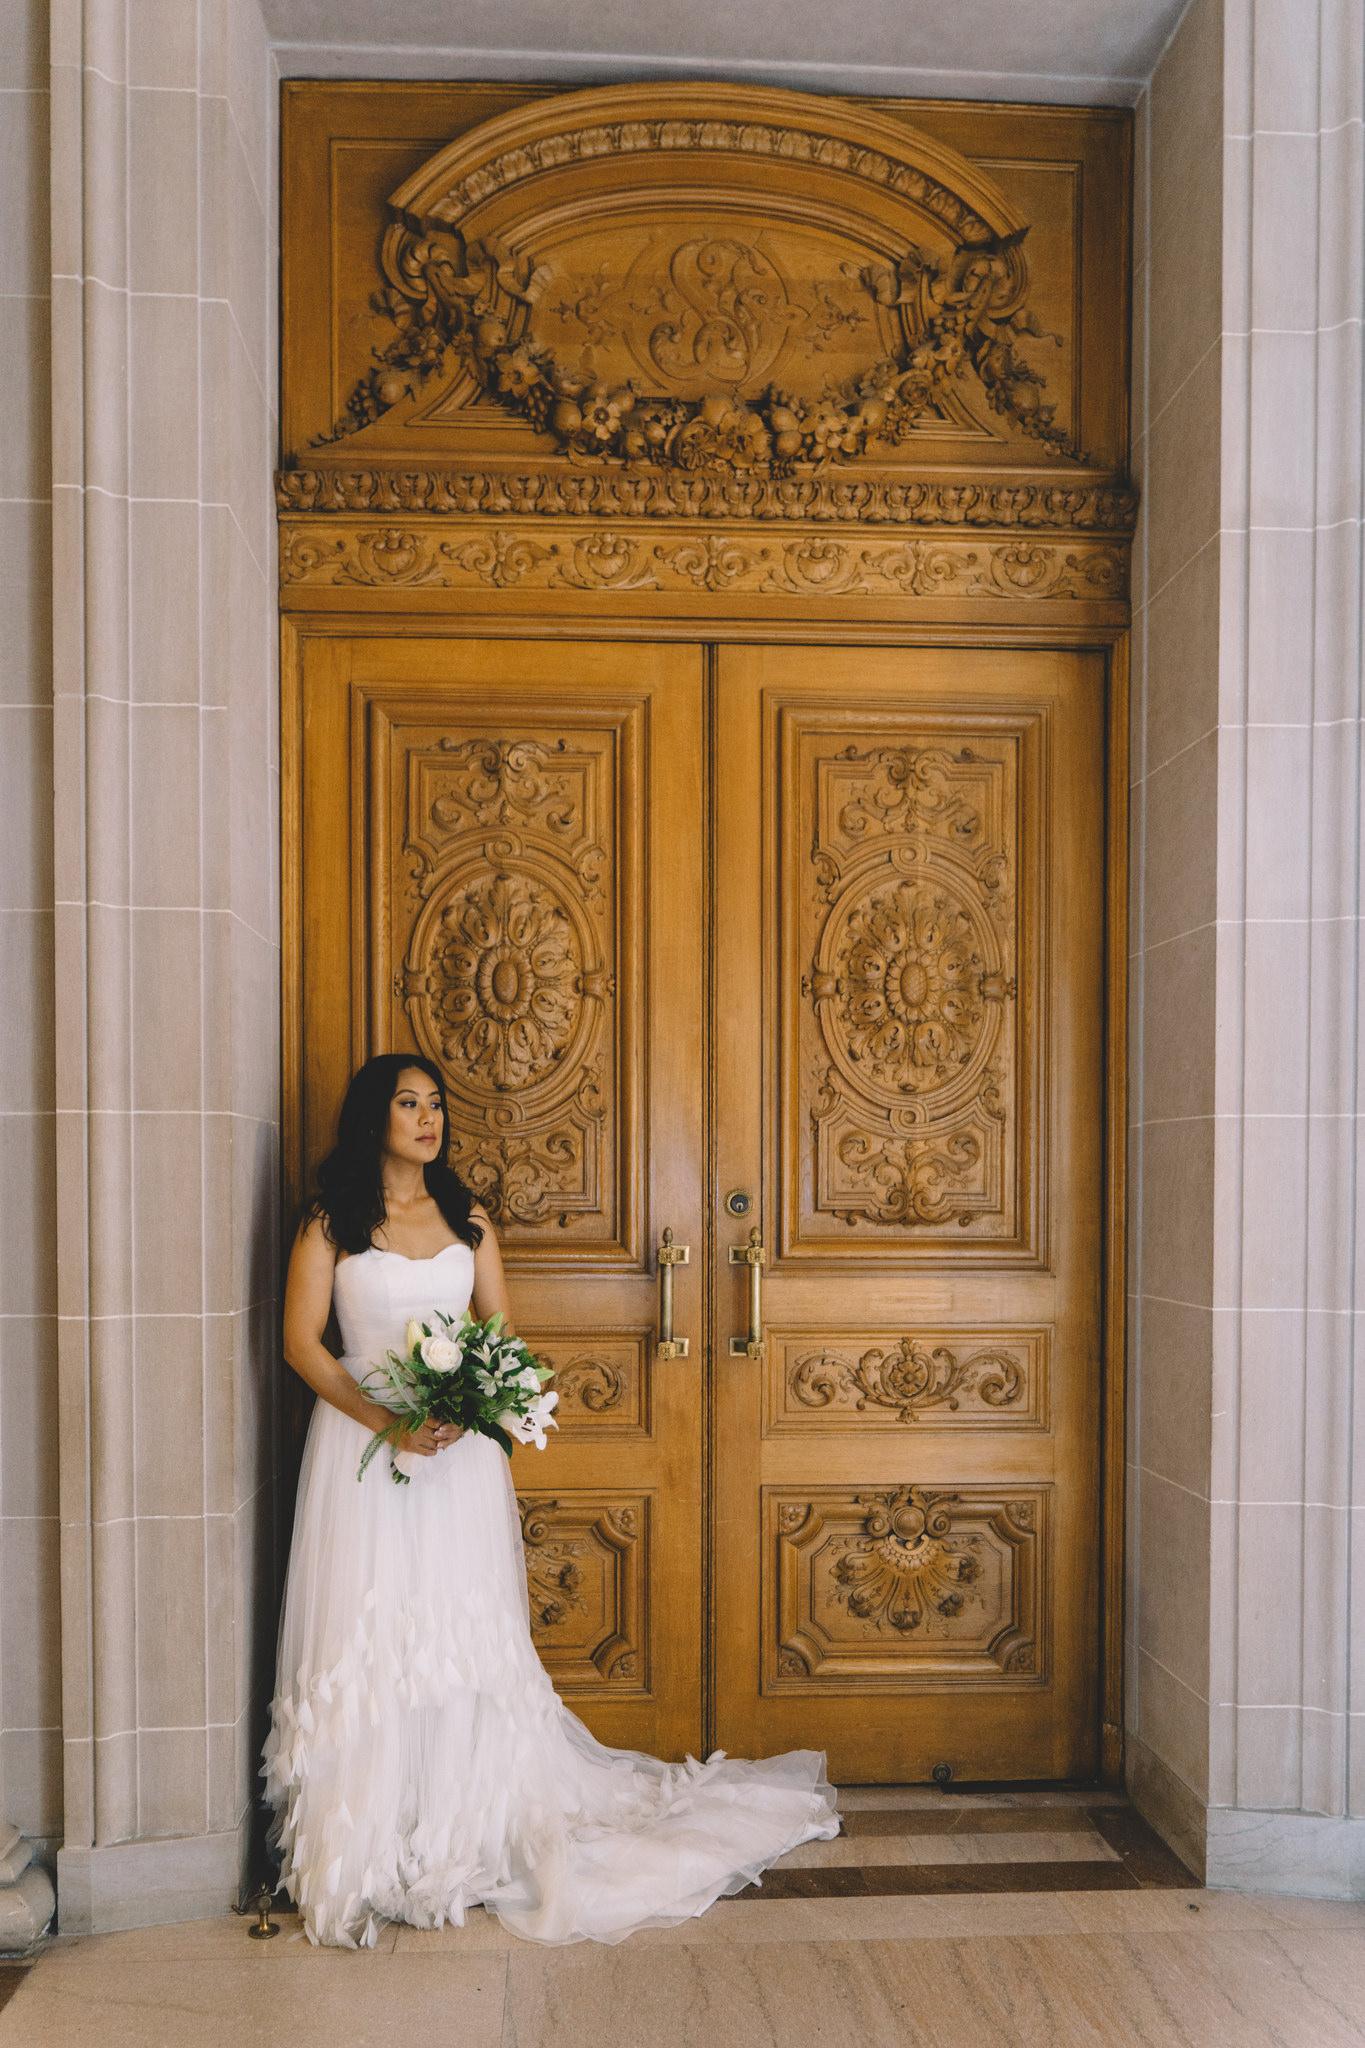 city-hall-doors.jpg